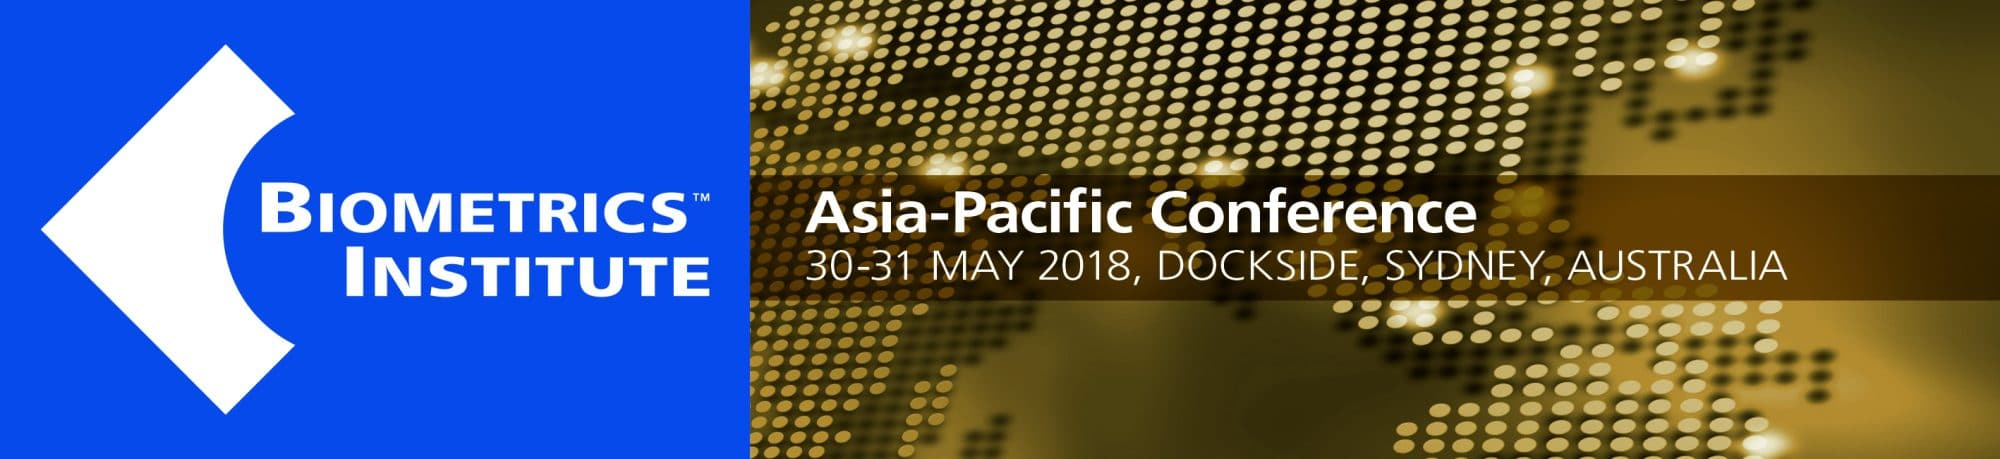 Biometrics-Institute-Asia-Pacific-Conference